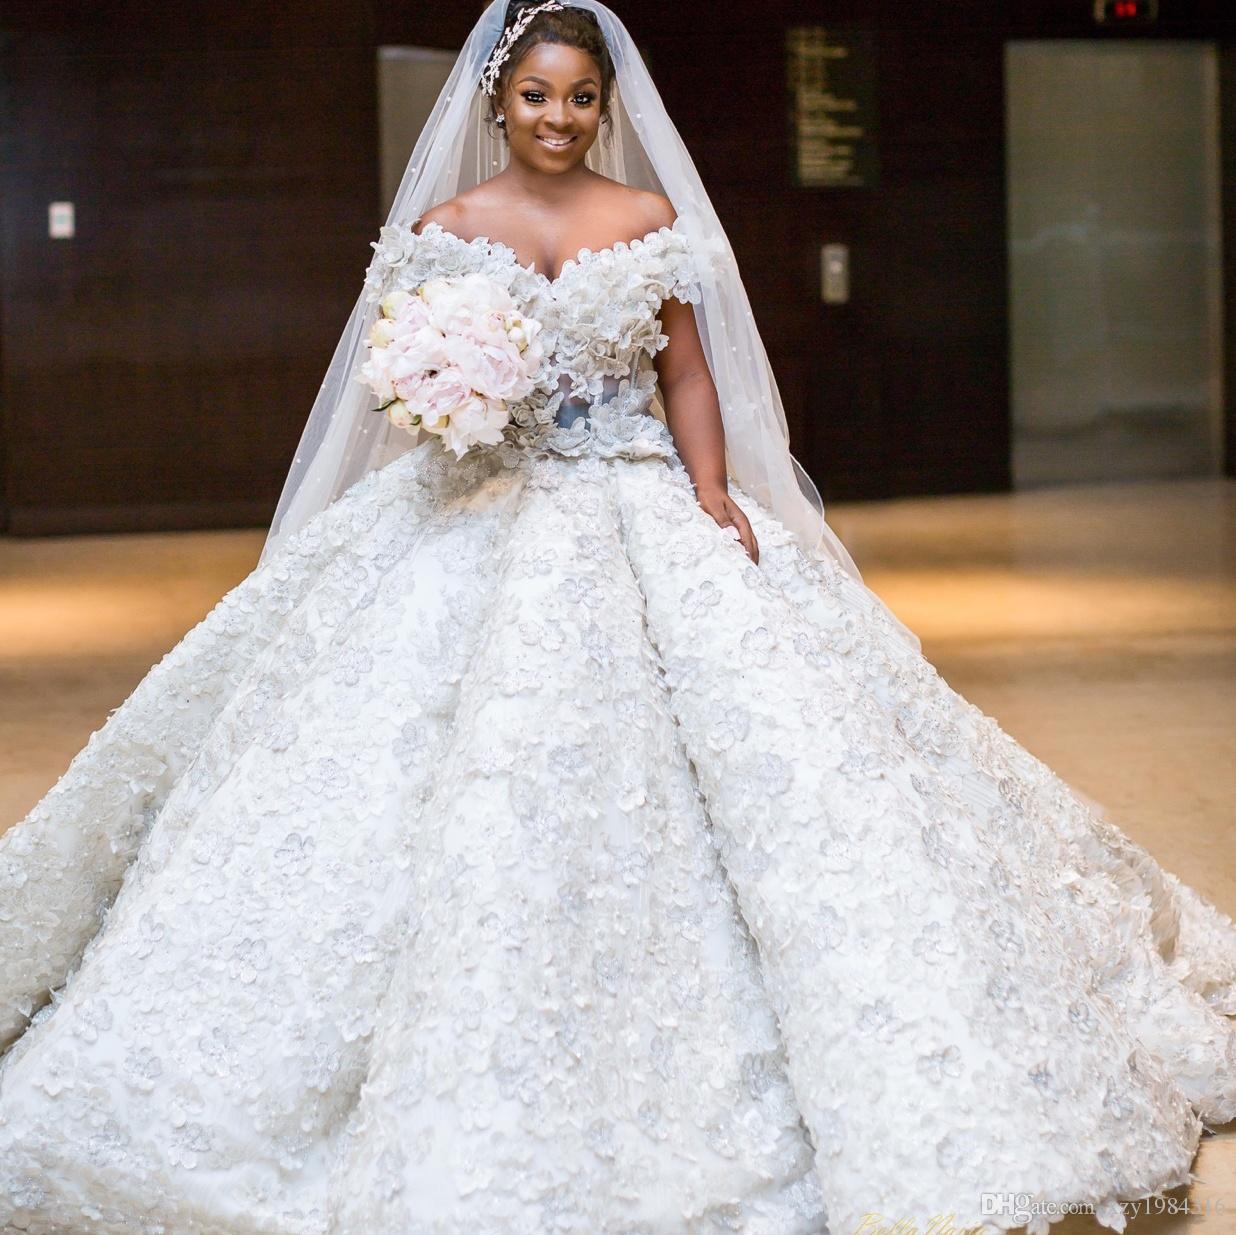 74d2ada65 Vestido Para Festa Lindo Sul Africano Princesa Do Vestido De Casamento Fora  Do Ombro Frisado 3D Floral Applique Vestido De Baile Vestido De Noiva  Fabuloso ...